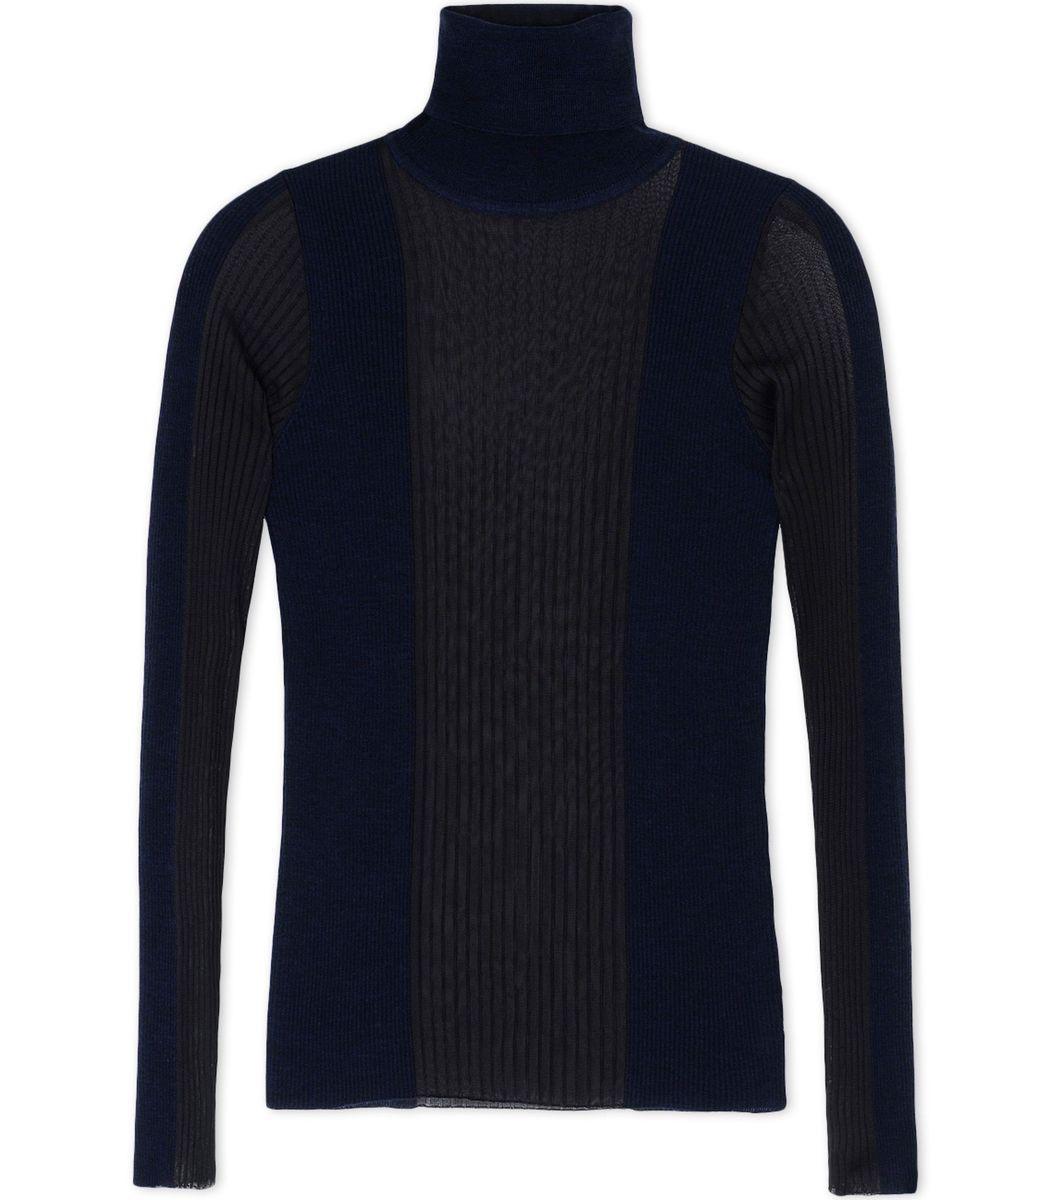 Emilio Pucci Sheer Navy Turtleneck Sweater | Knitwear | Pinterest ...